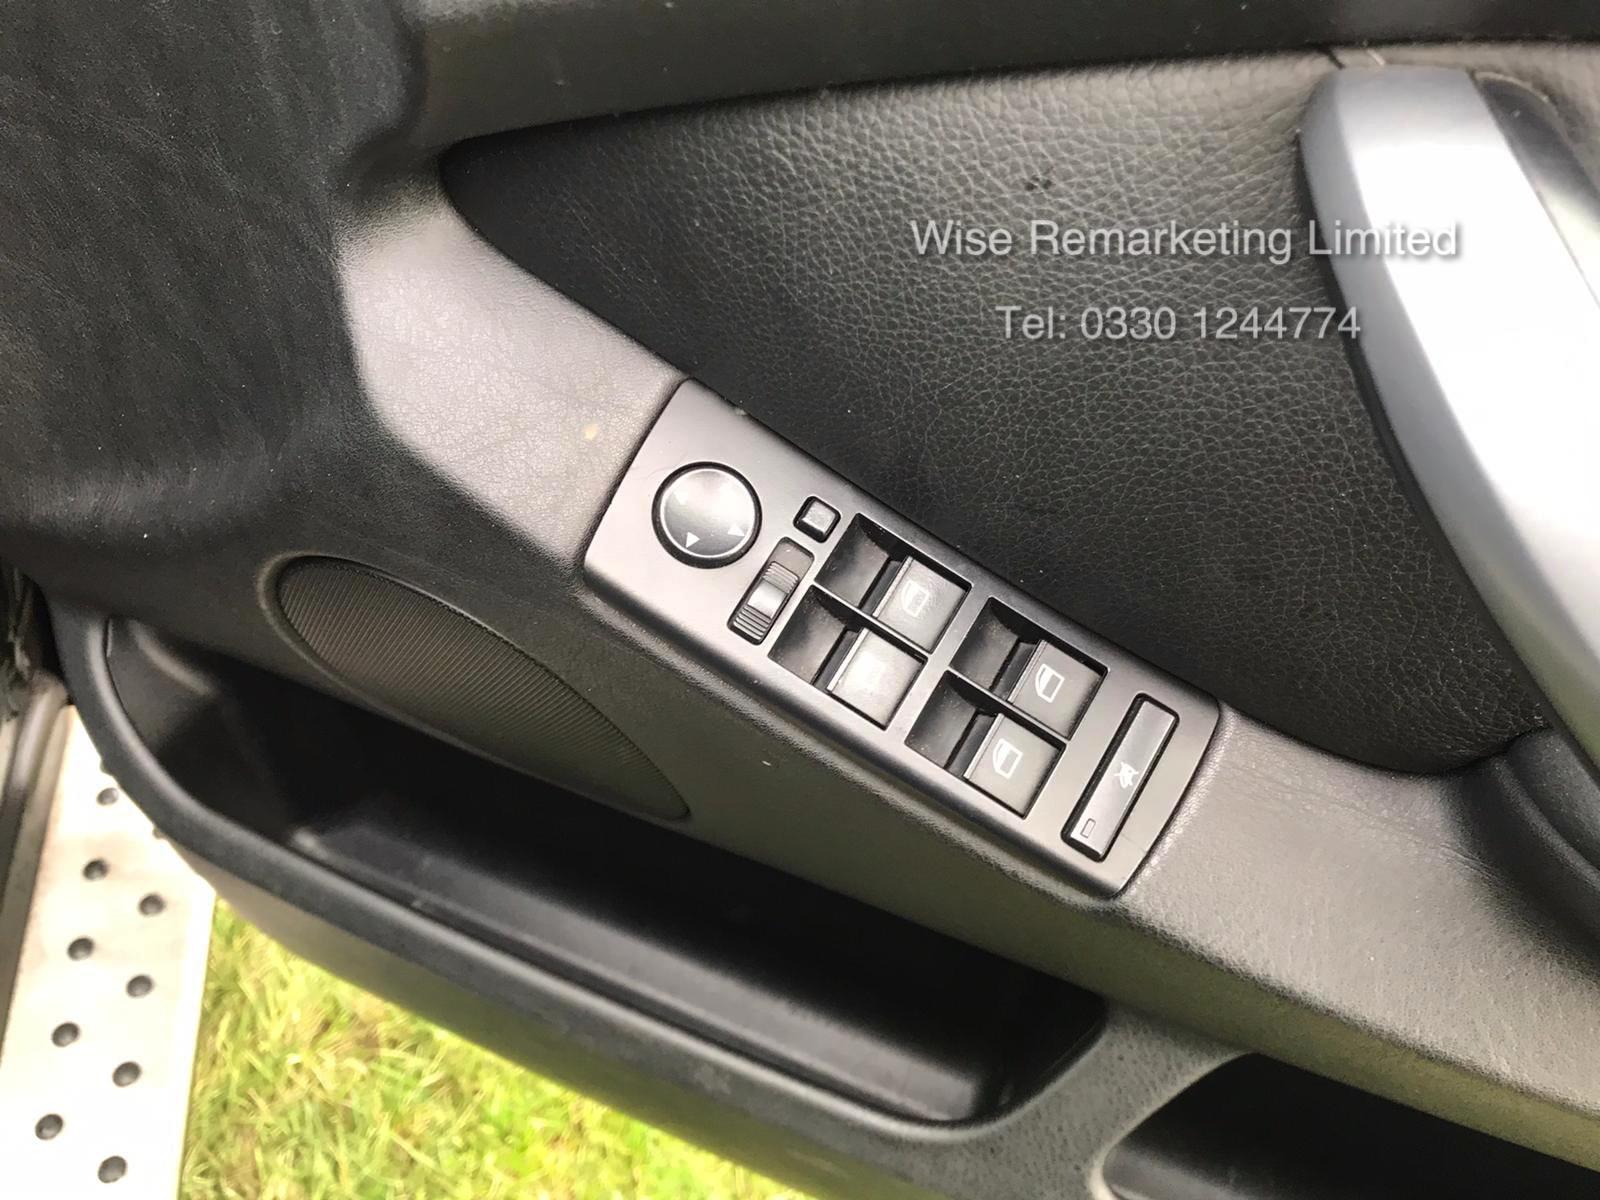 Lot 39 - BMW X5 3.0i Sport - 2006 Model - 4x4 - BIG SPEC - TV/DVD Player - Pan Roof - Sat Nav